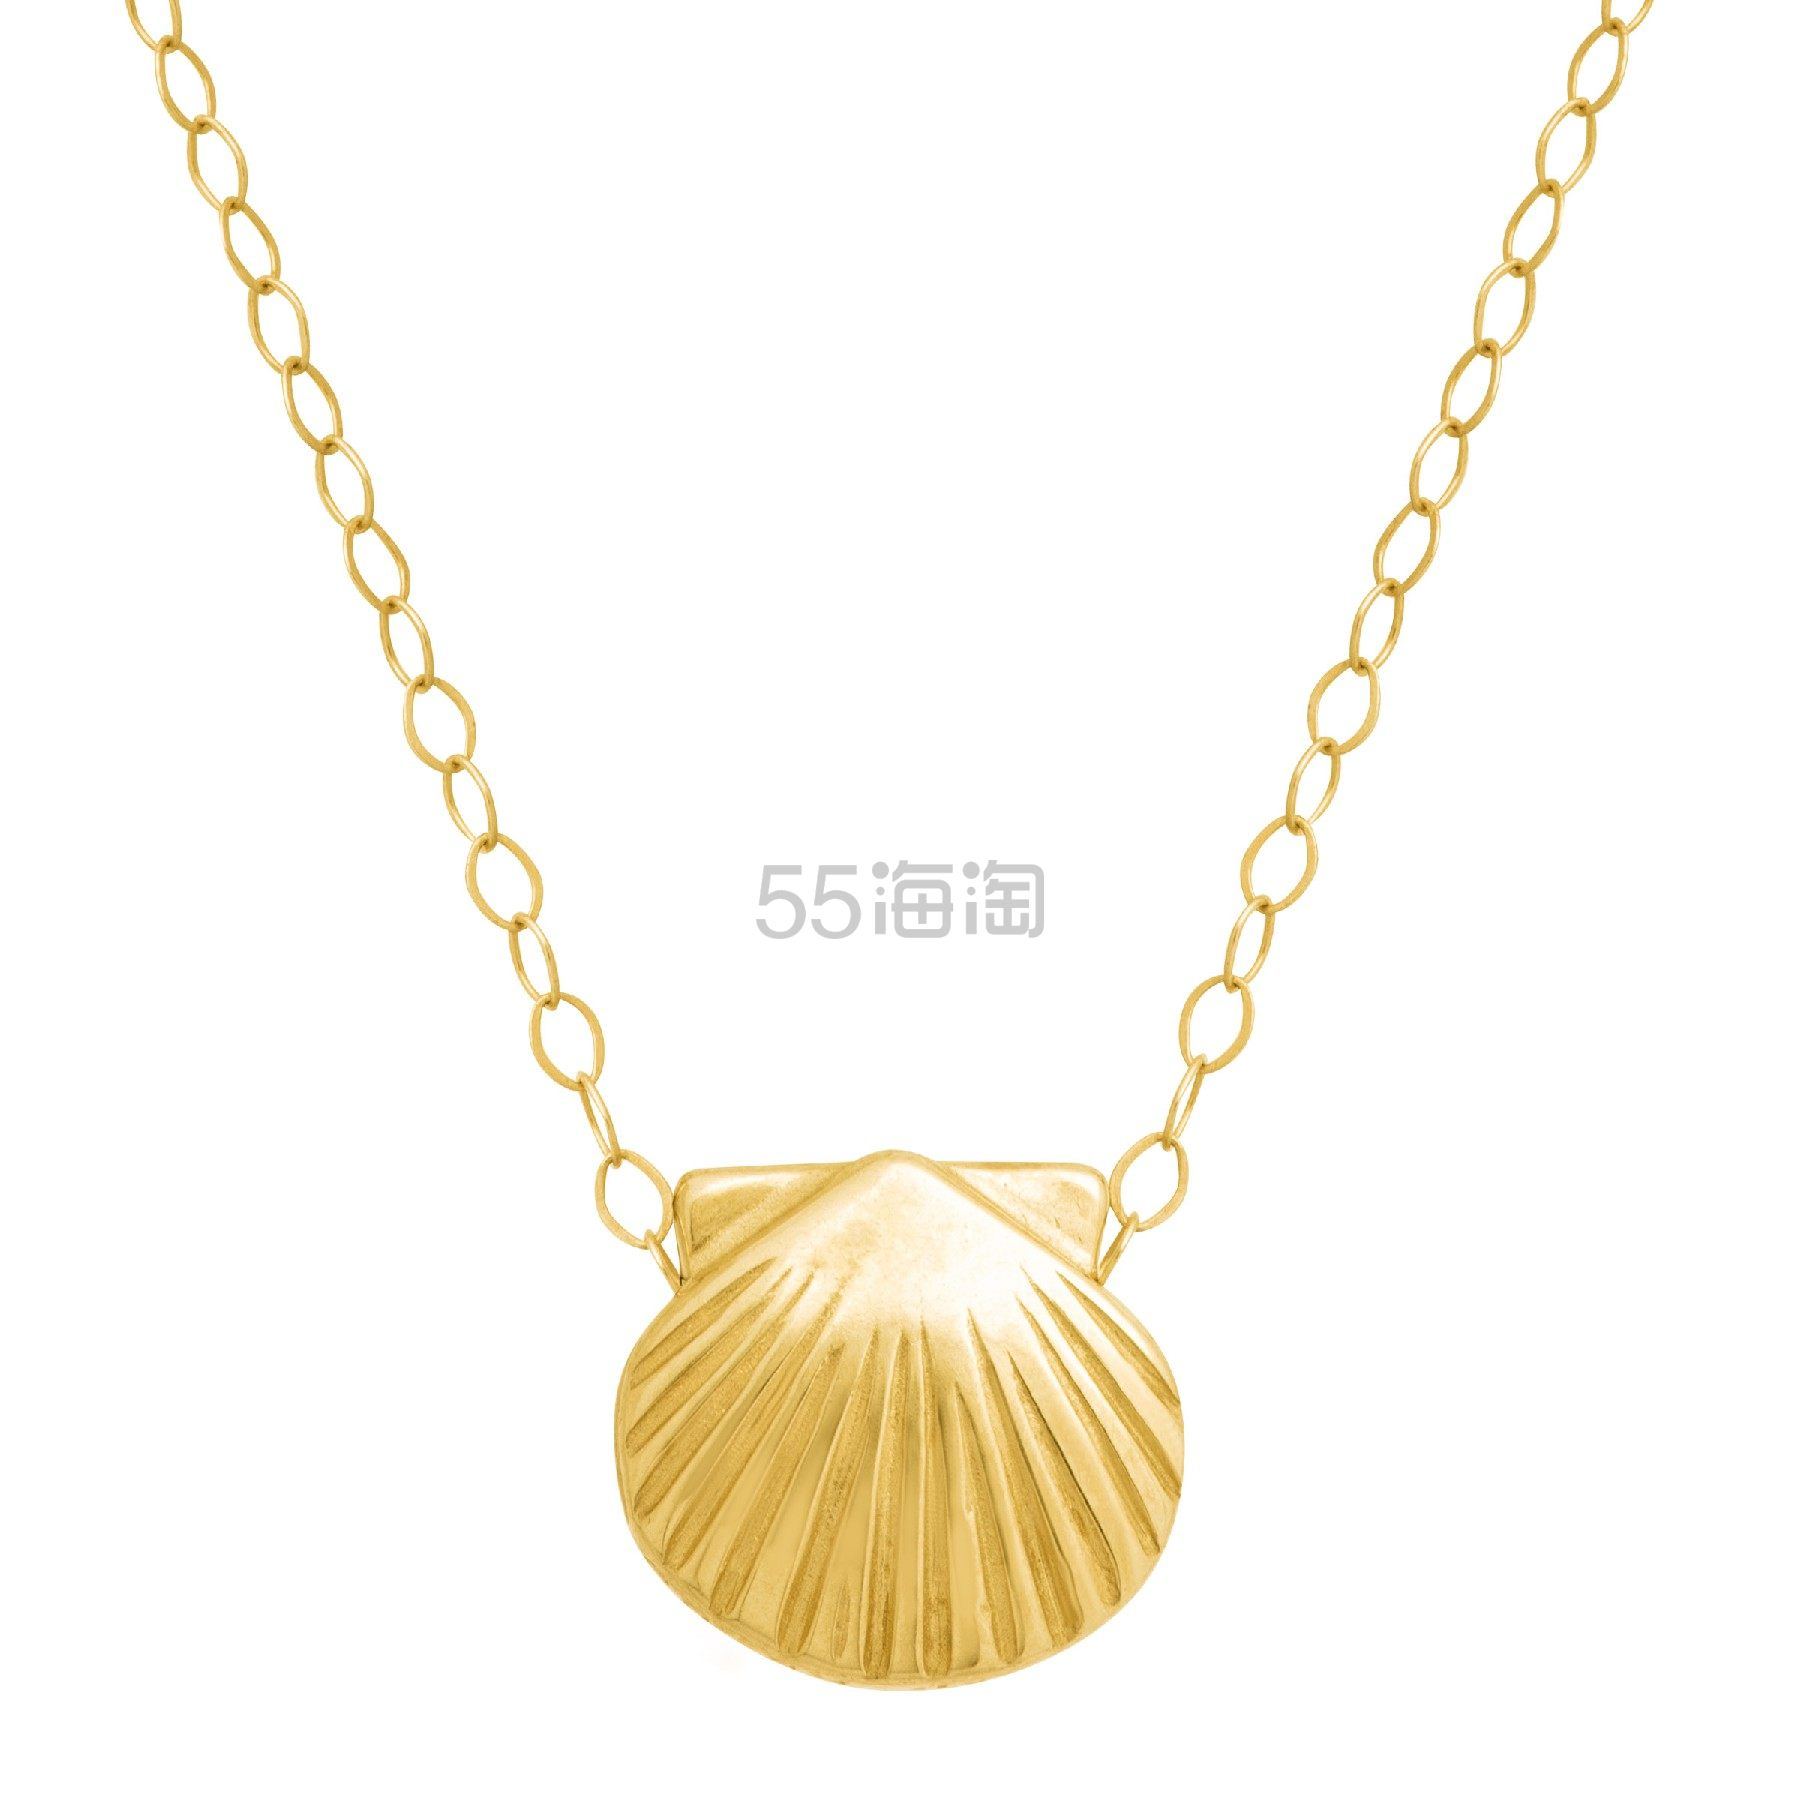 ETERNITY GOLD 14K 黄金贝壳项链 (约616元) - 海淘优惠海淘折扣|55海淘网